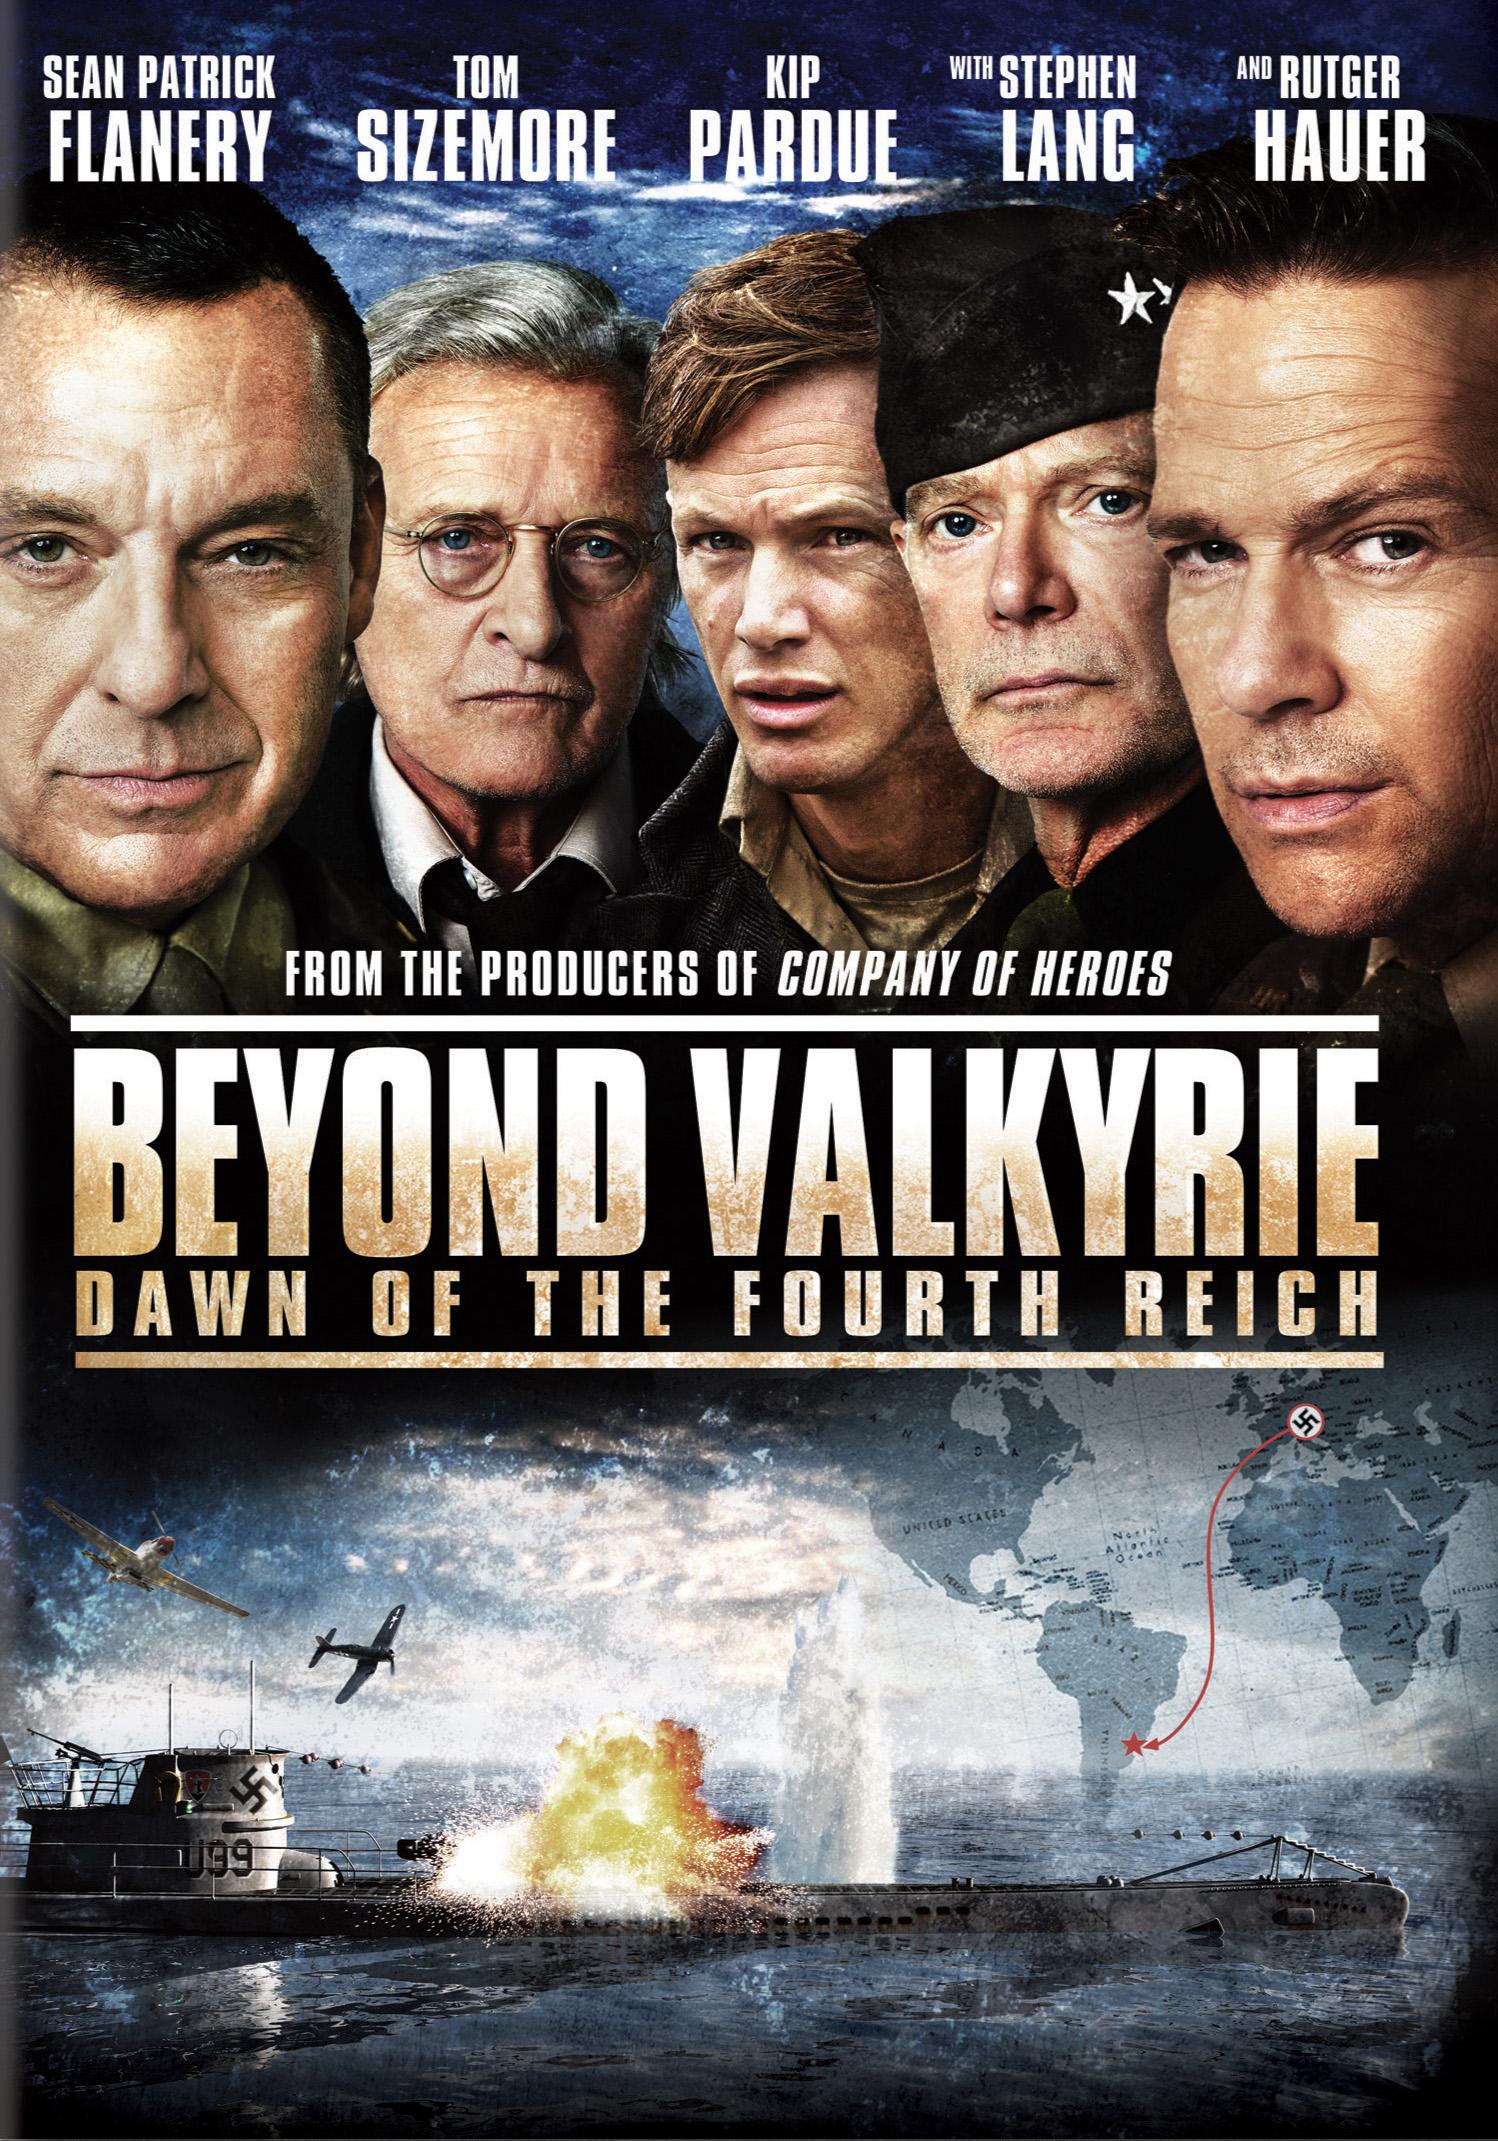 Beyond Valkyrie: Dawn of the 4th Reich (2016) - IMDb